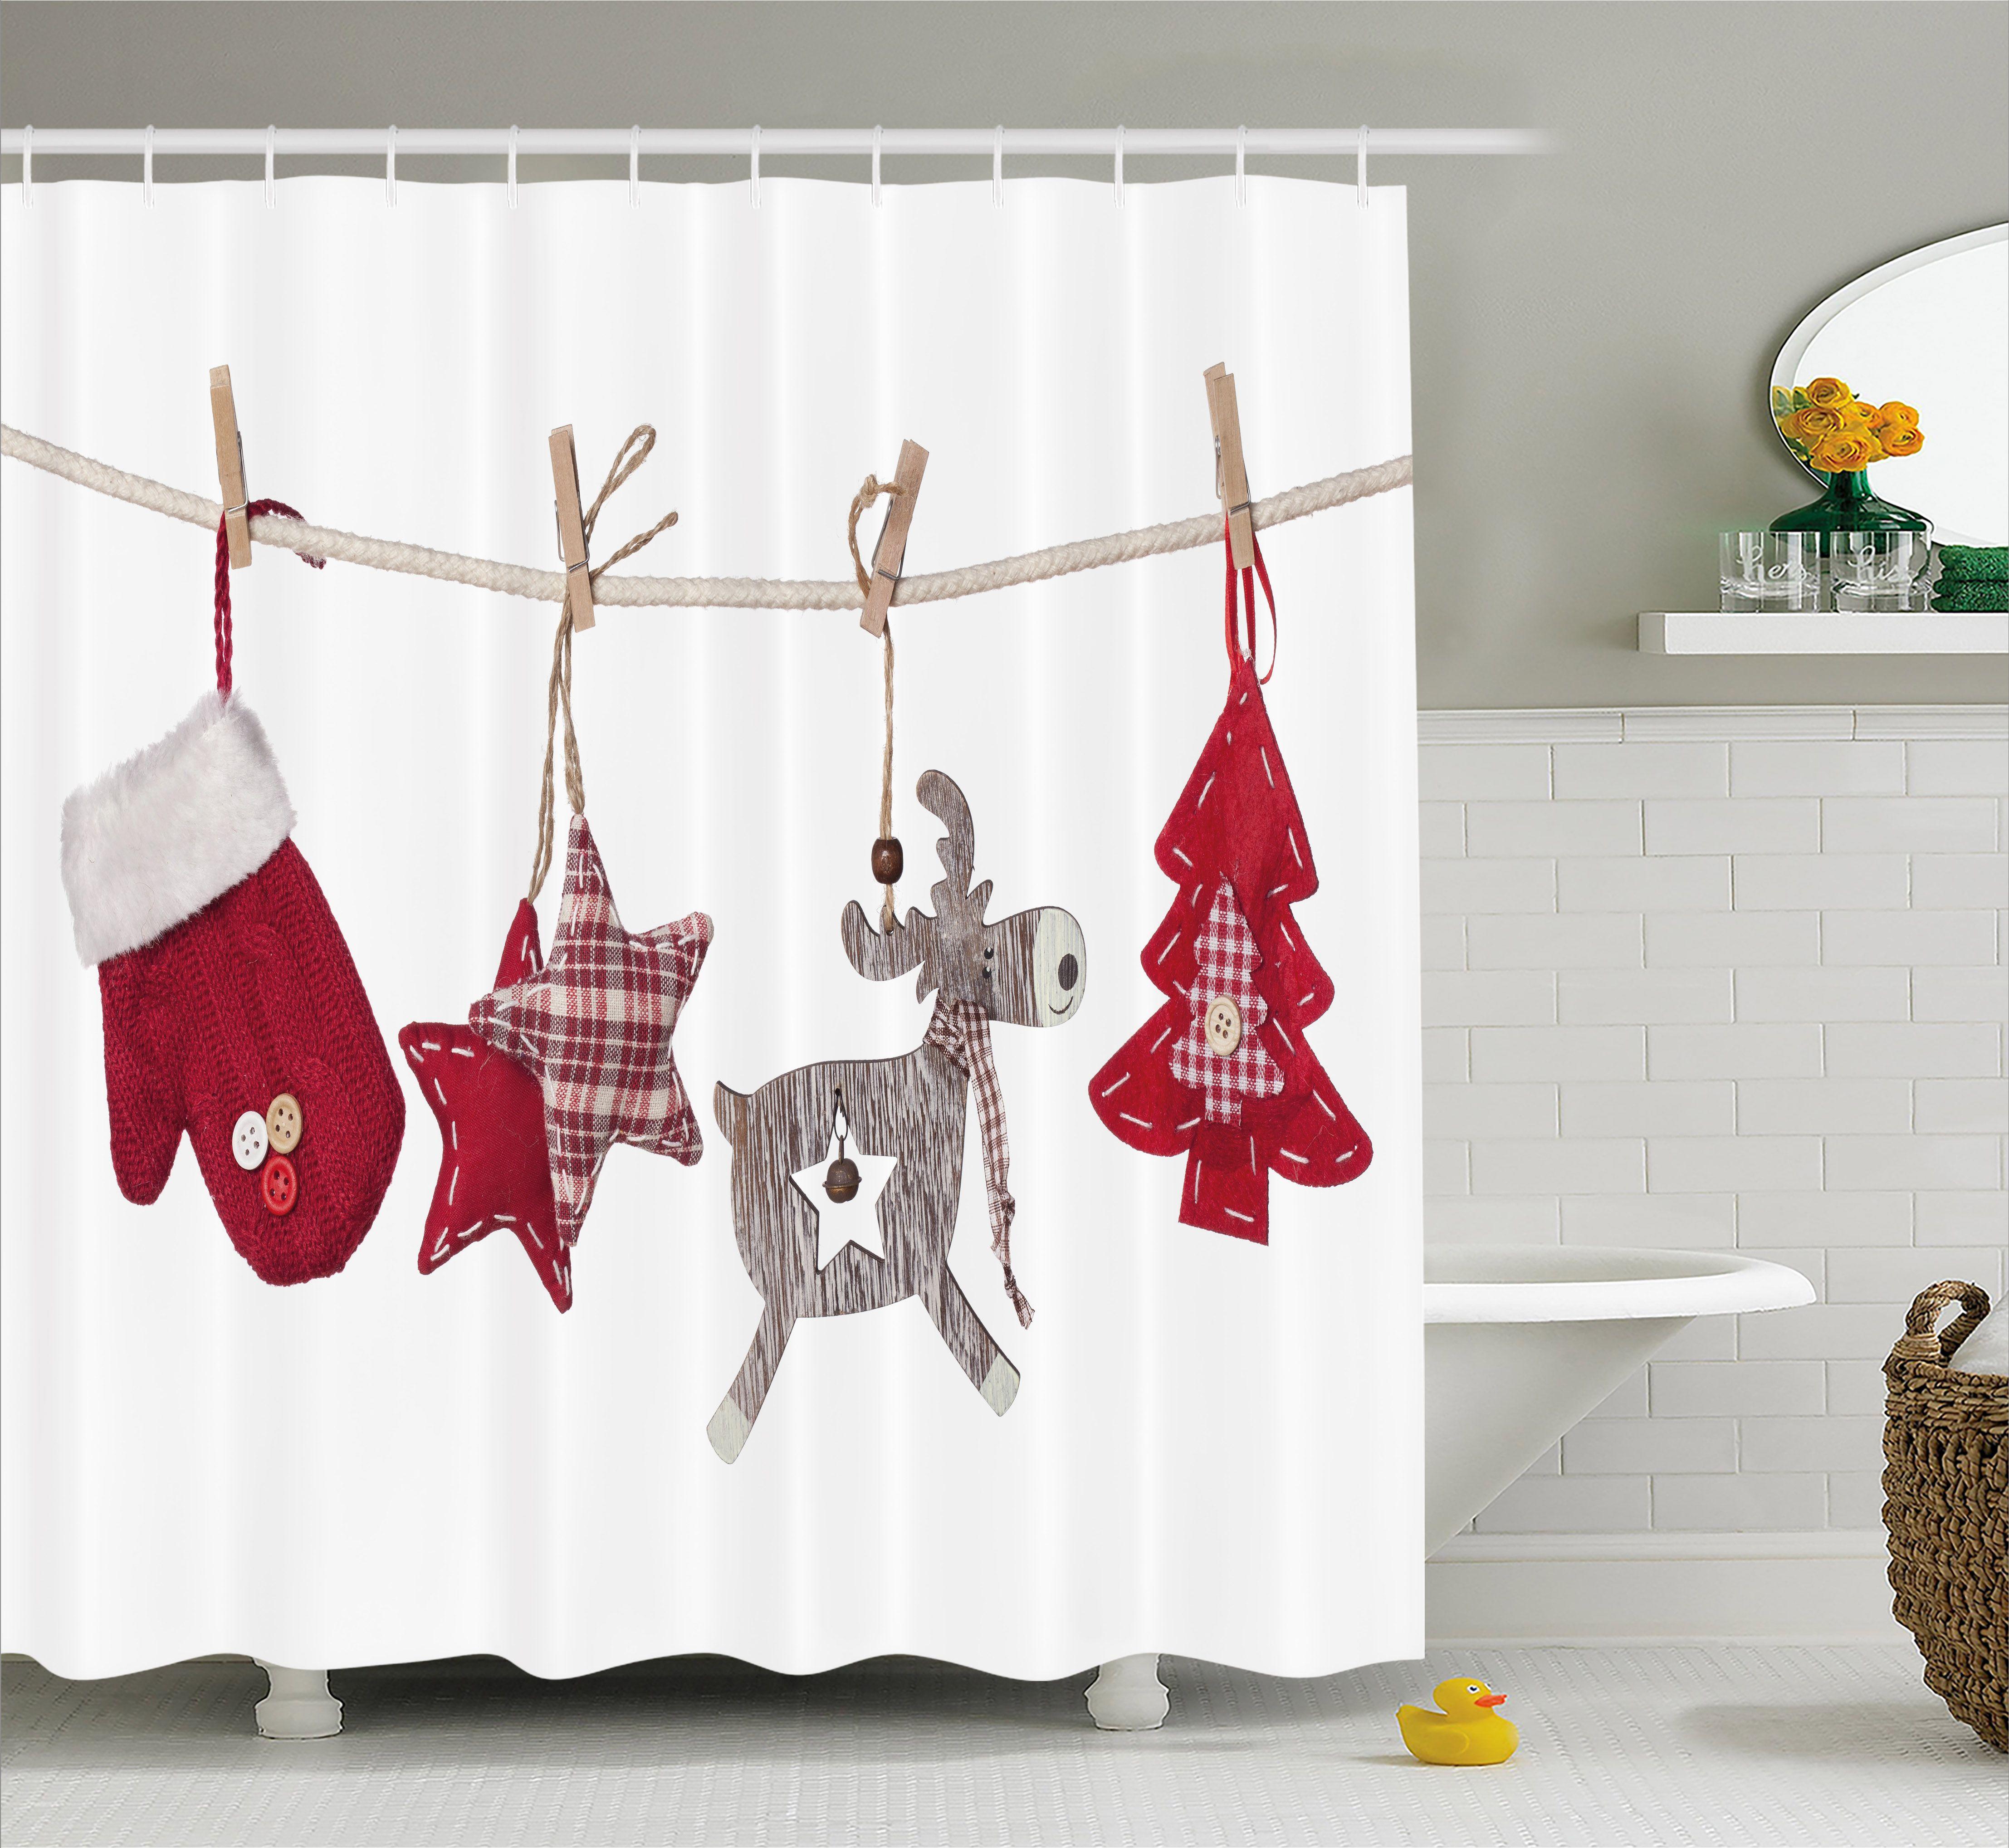 Christmas Shower Curtain Socks Hanging Christmas Shower Curtains